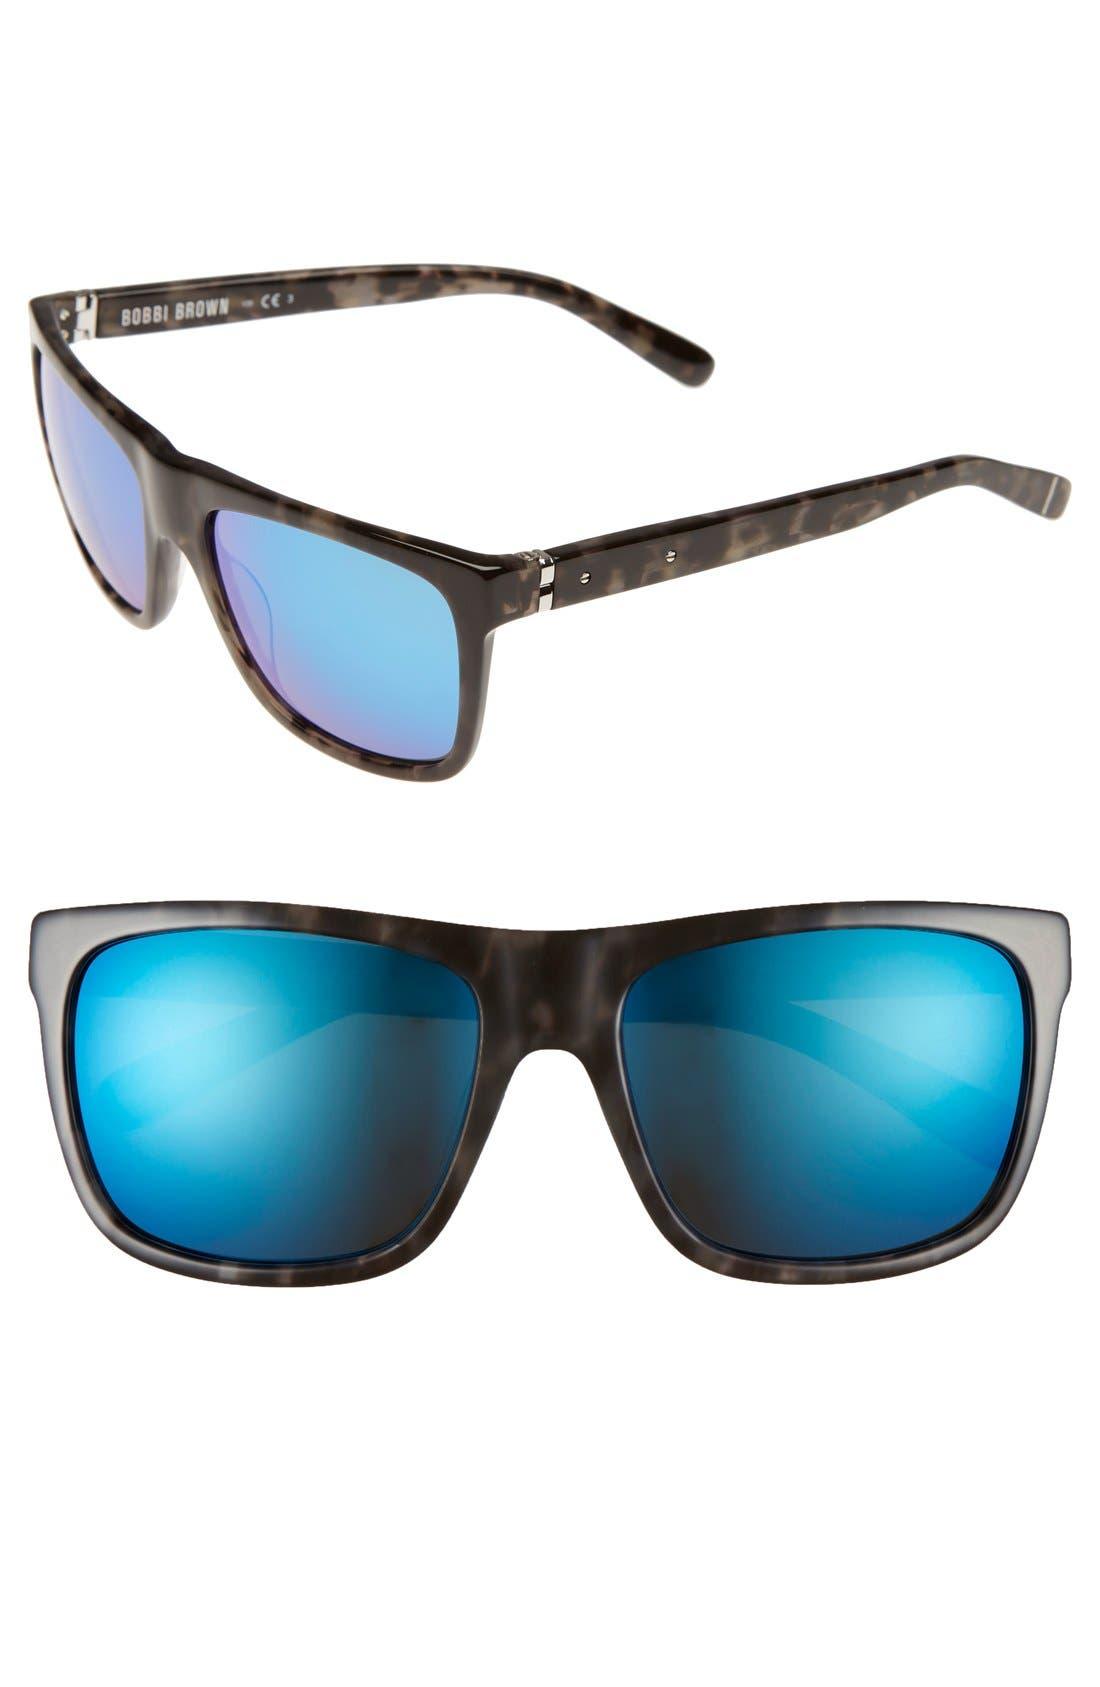 Main Image - Bobbi Brown 'The Harley' 55mm Sunglasses